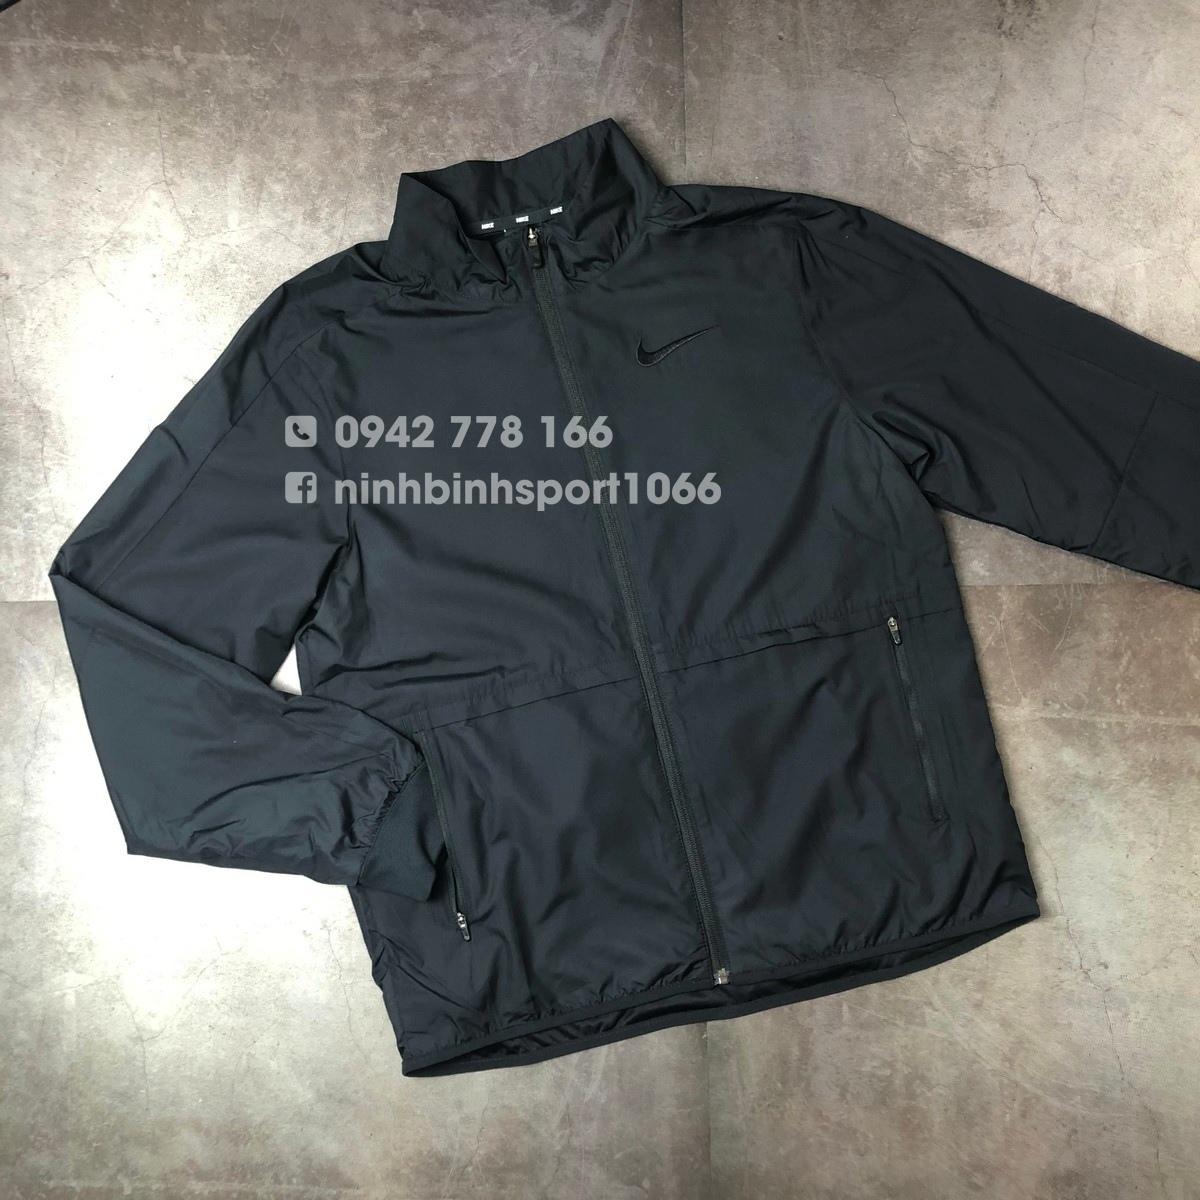 Áo khoác thể thao nam Nike Woven Insulated Jacket CU6739-010